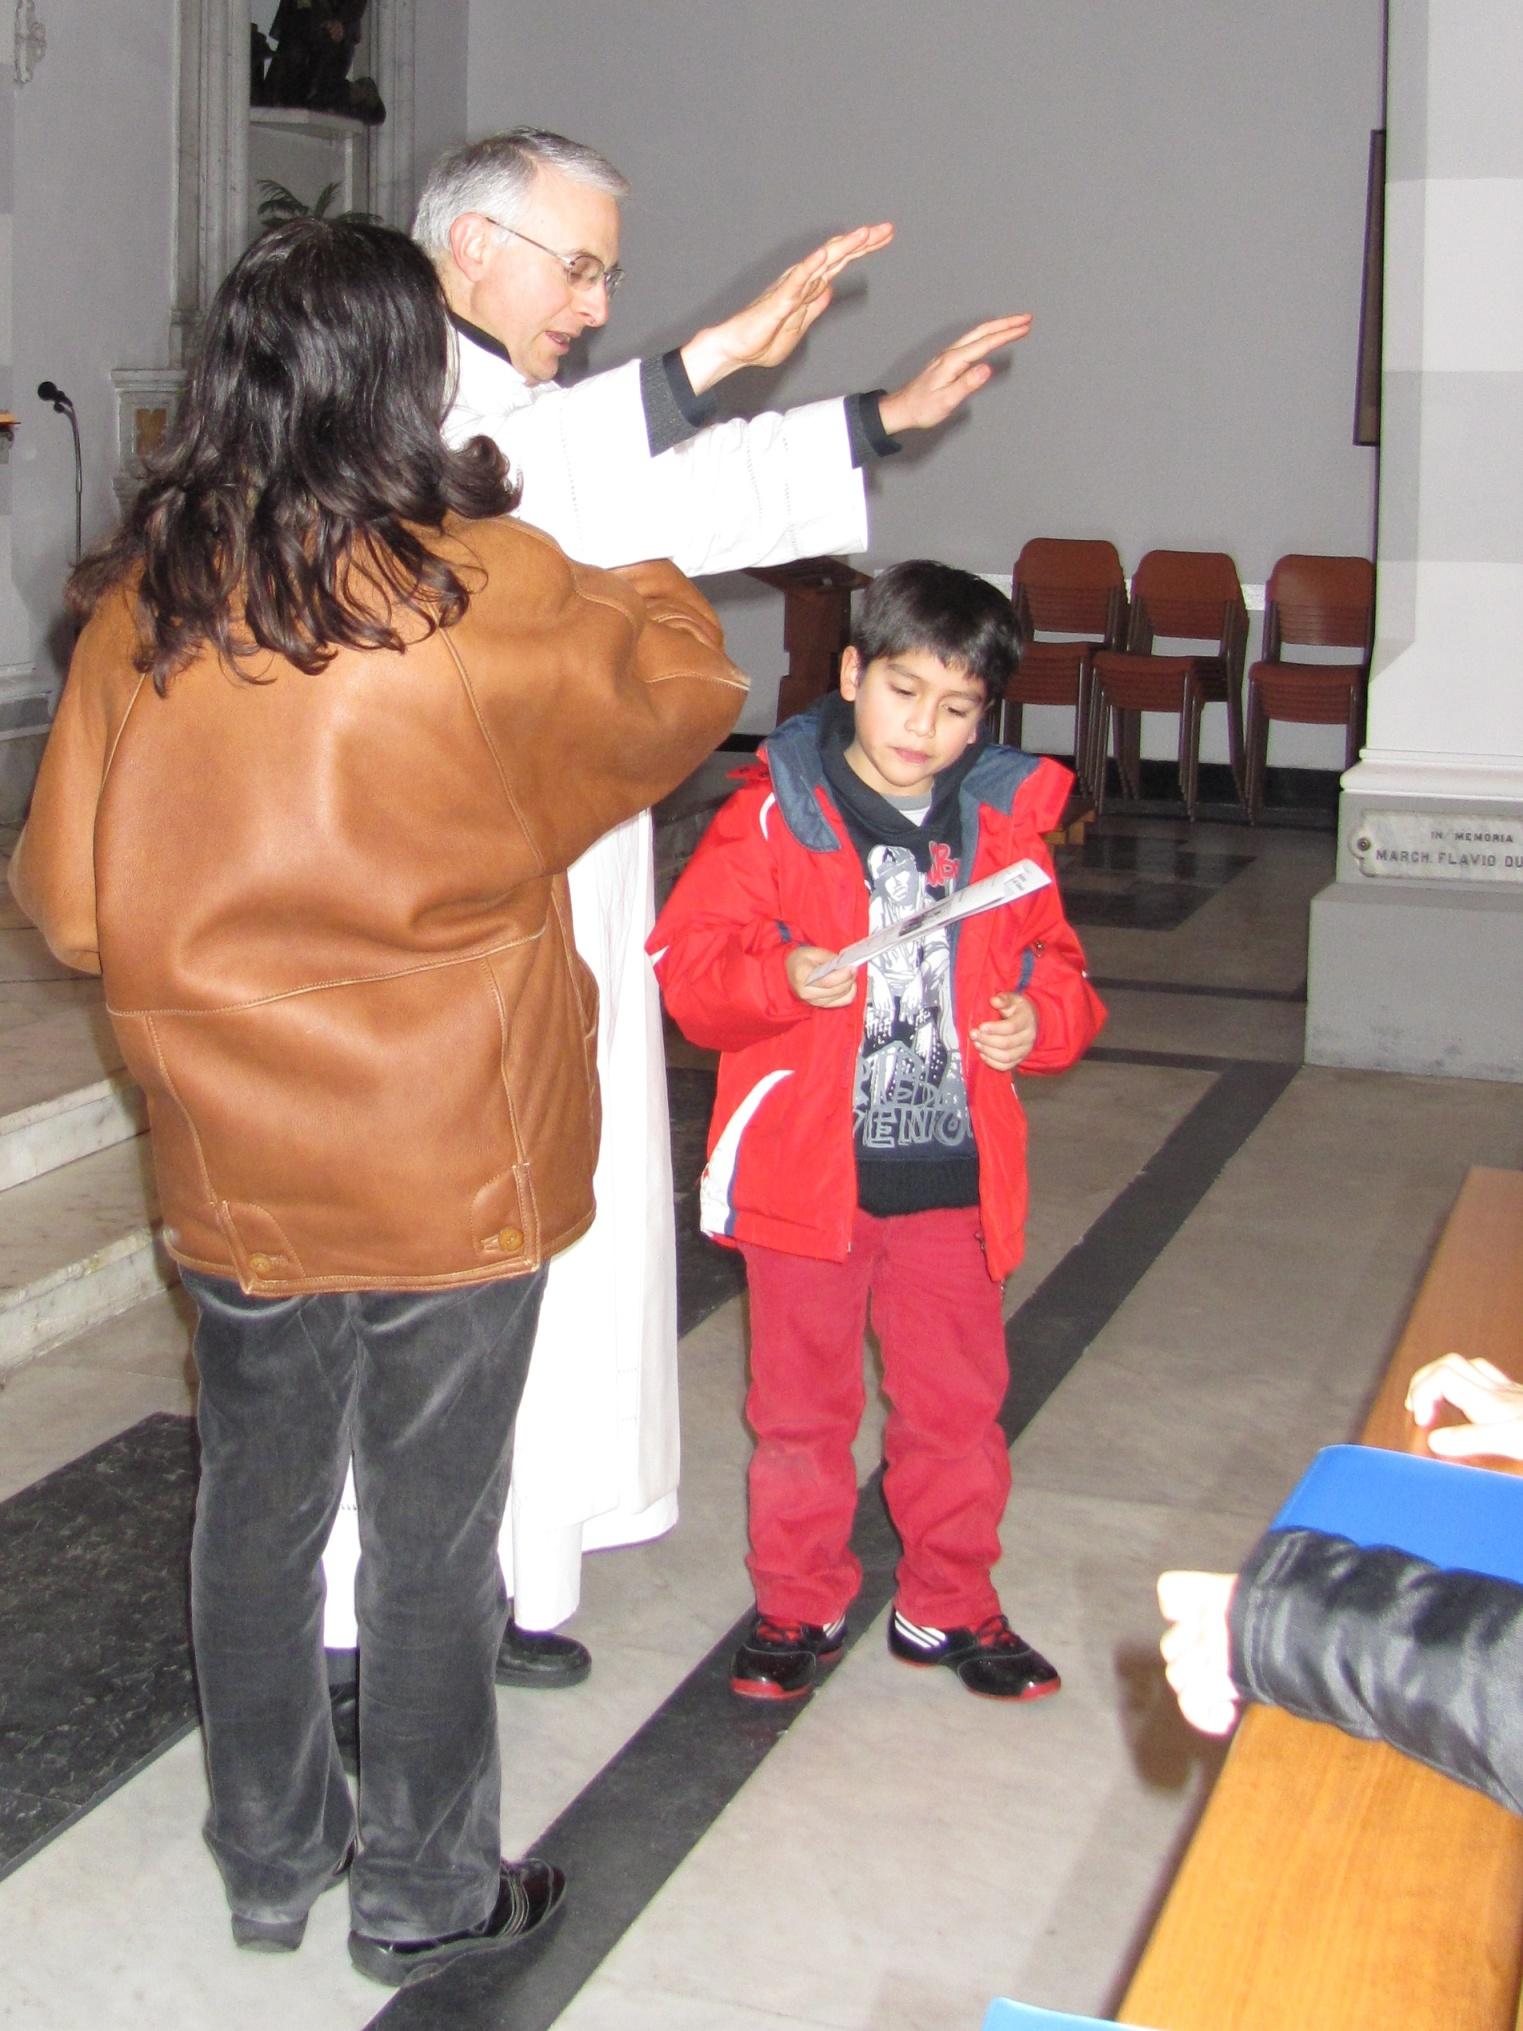 ricordo_battesimo_gesu_2011-01-23-16-27-30